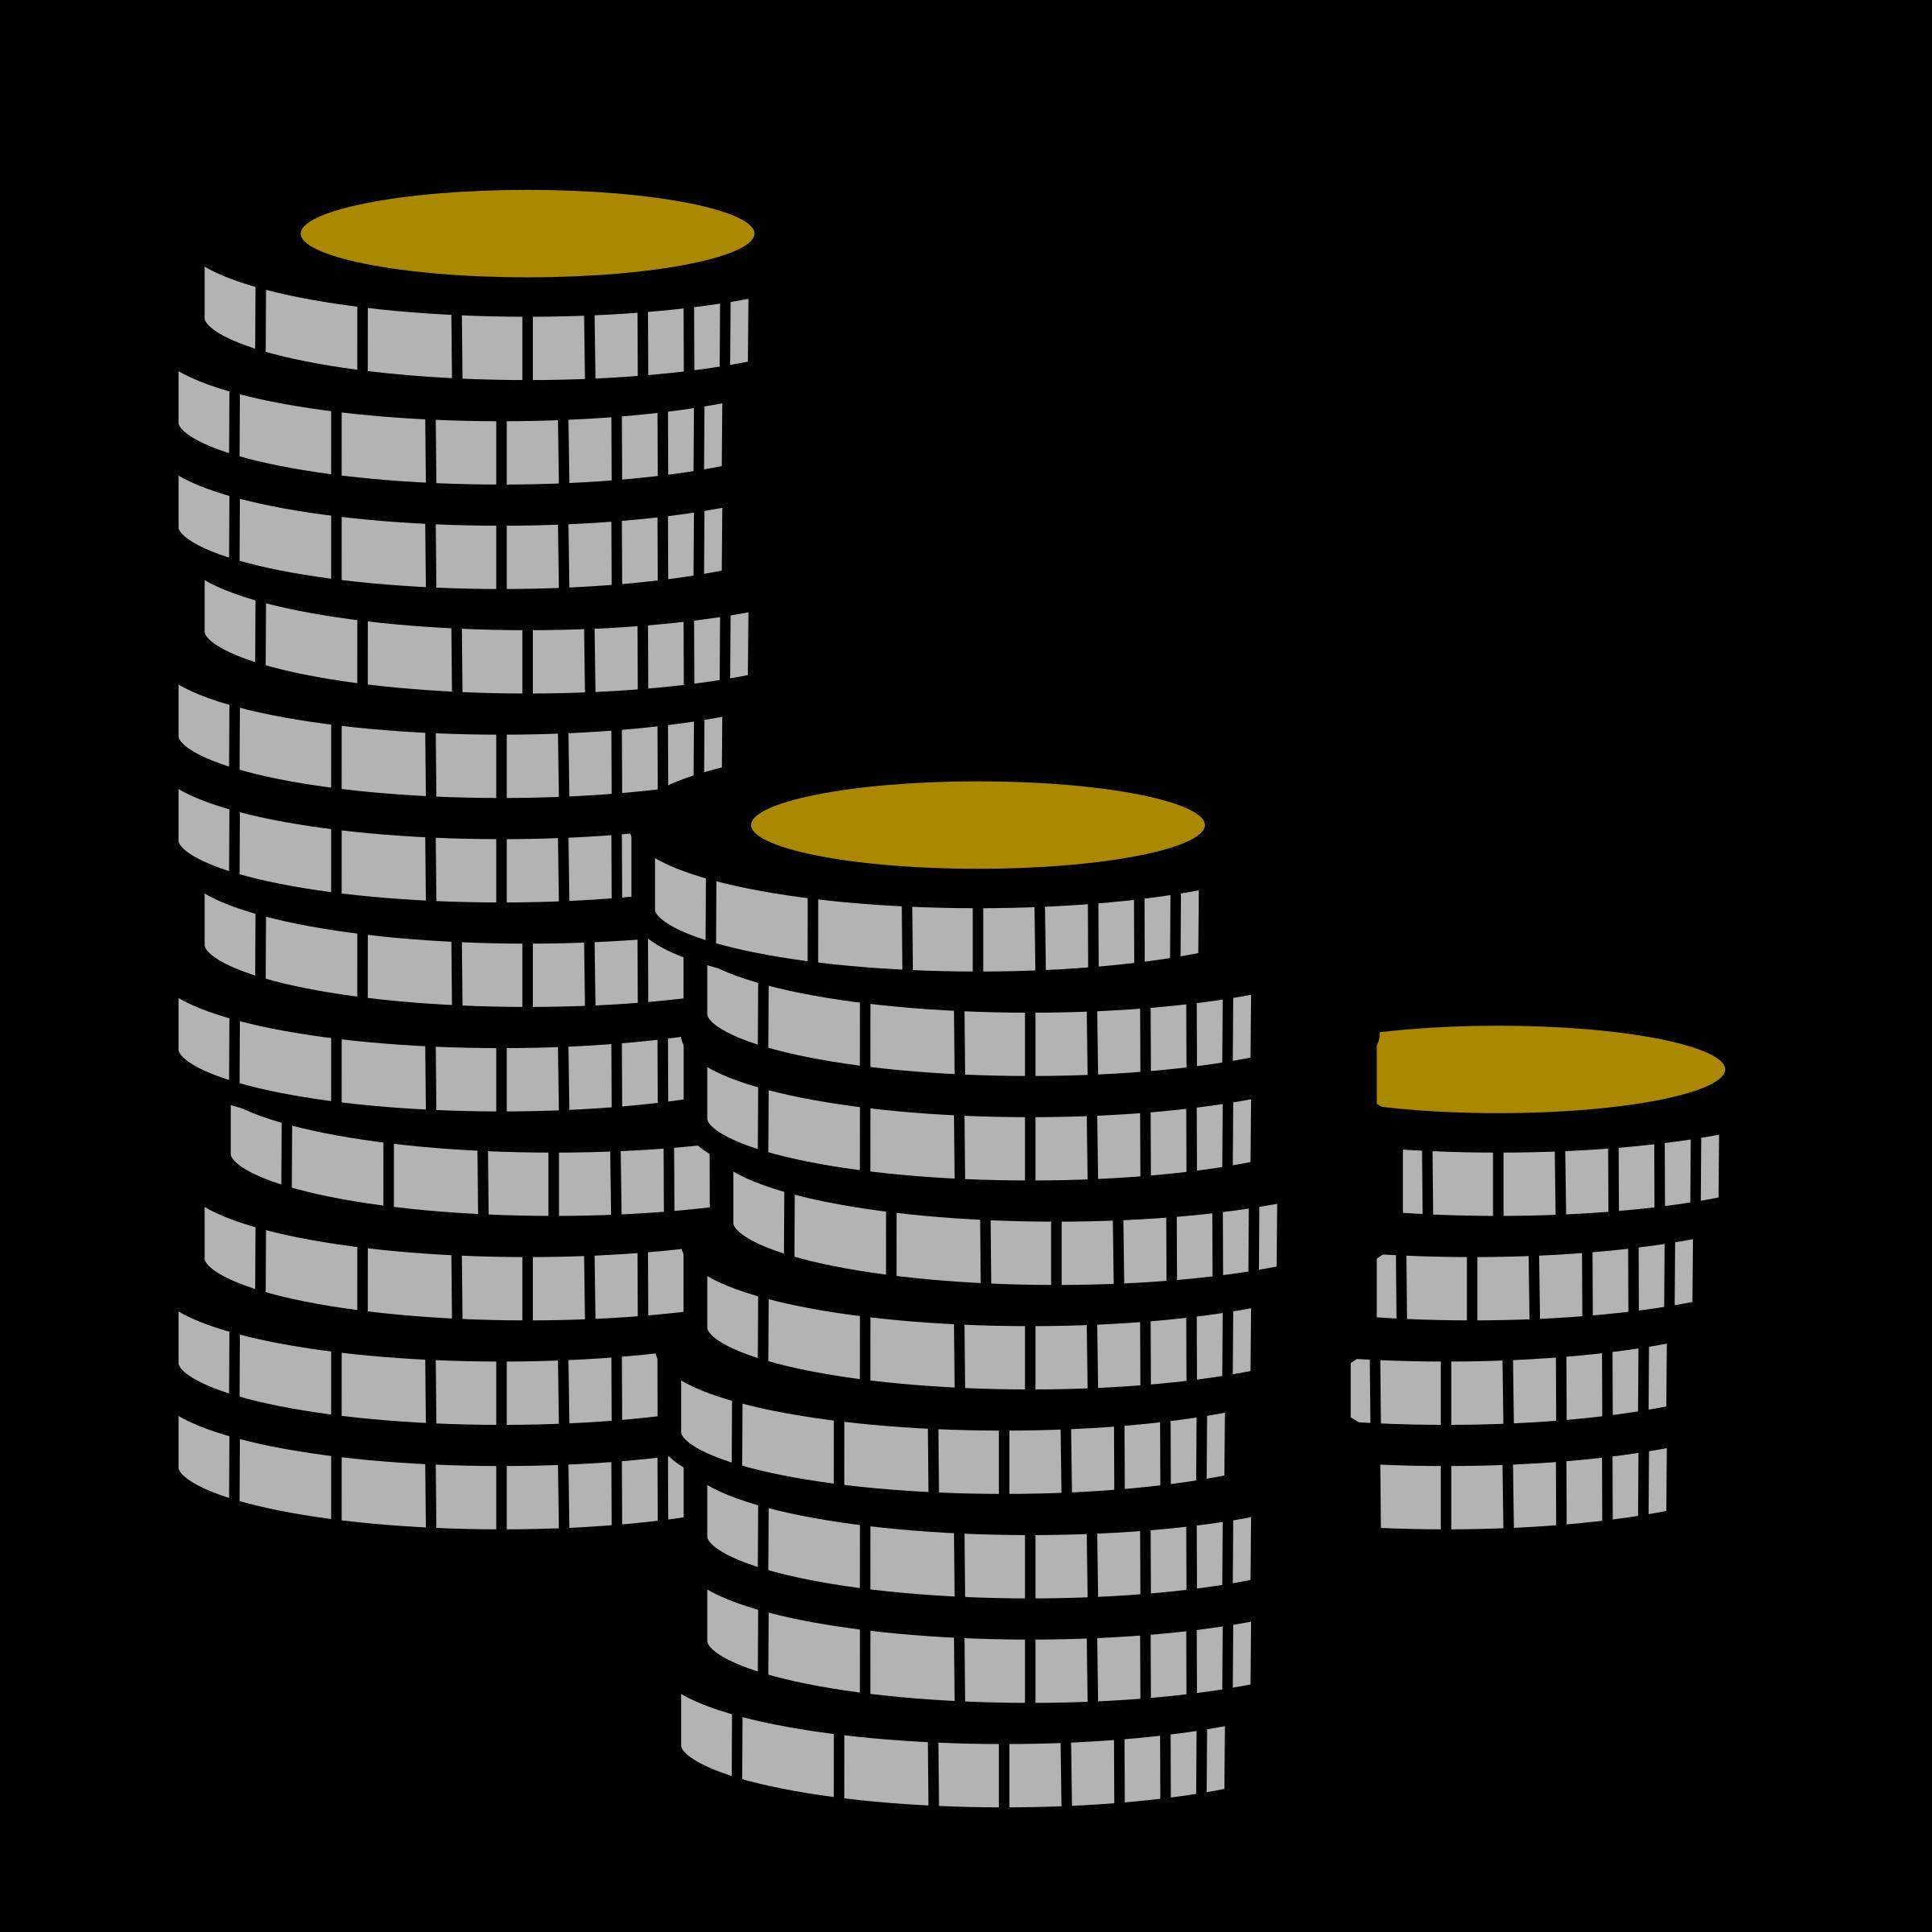 Coining money clipart clipart transparent stock Clipart - Coins clipart transparent stock